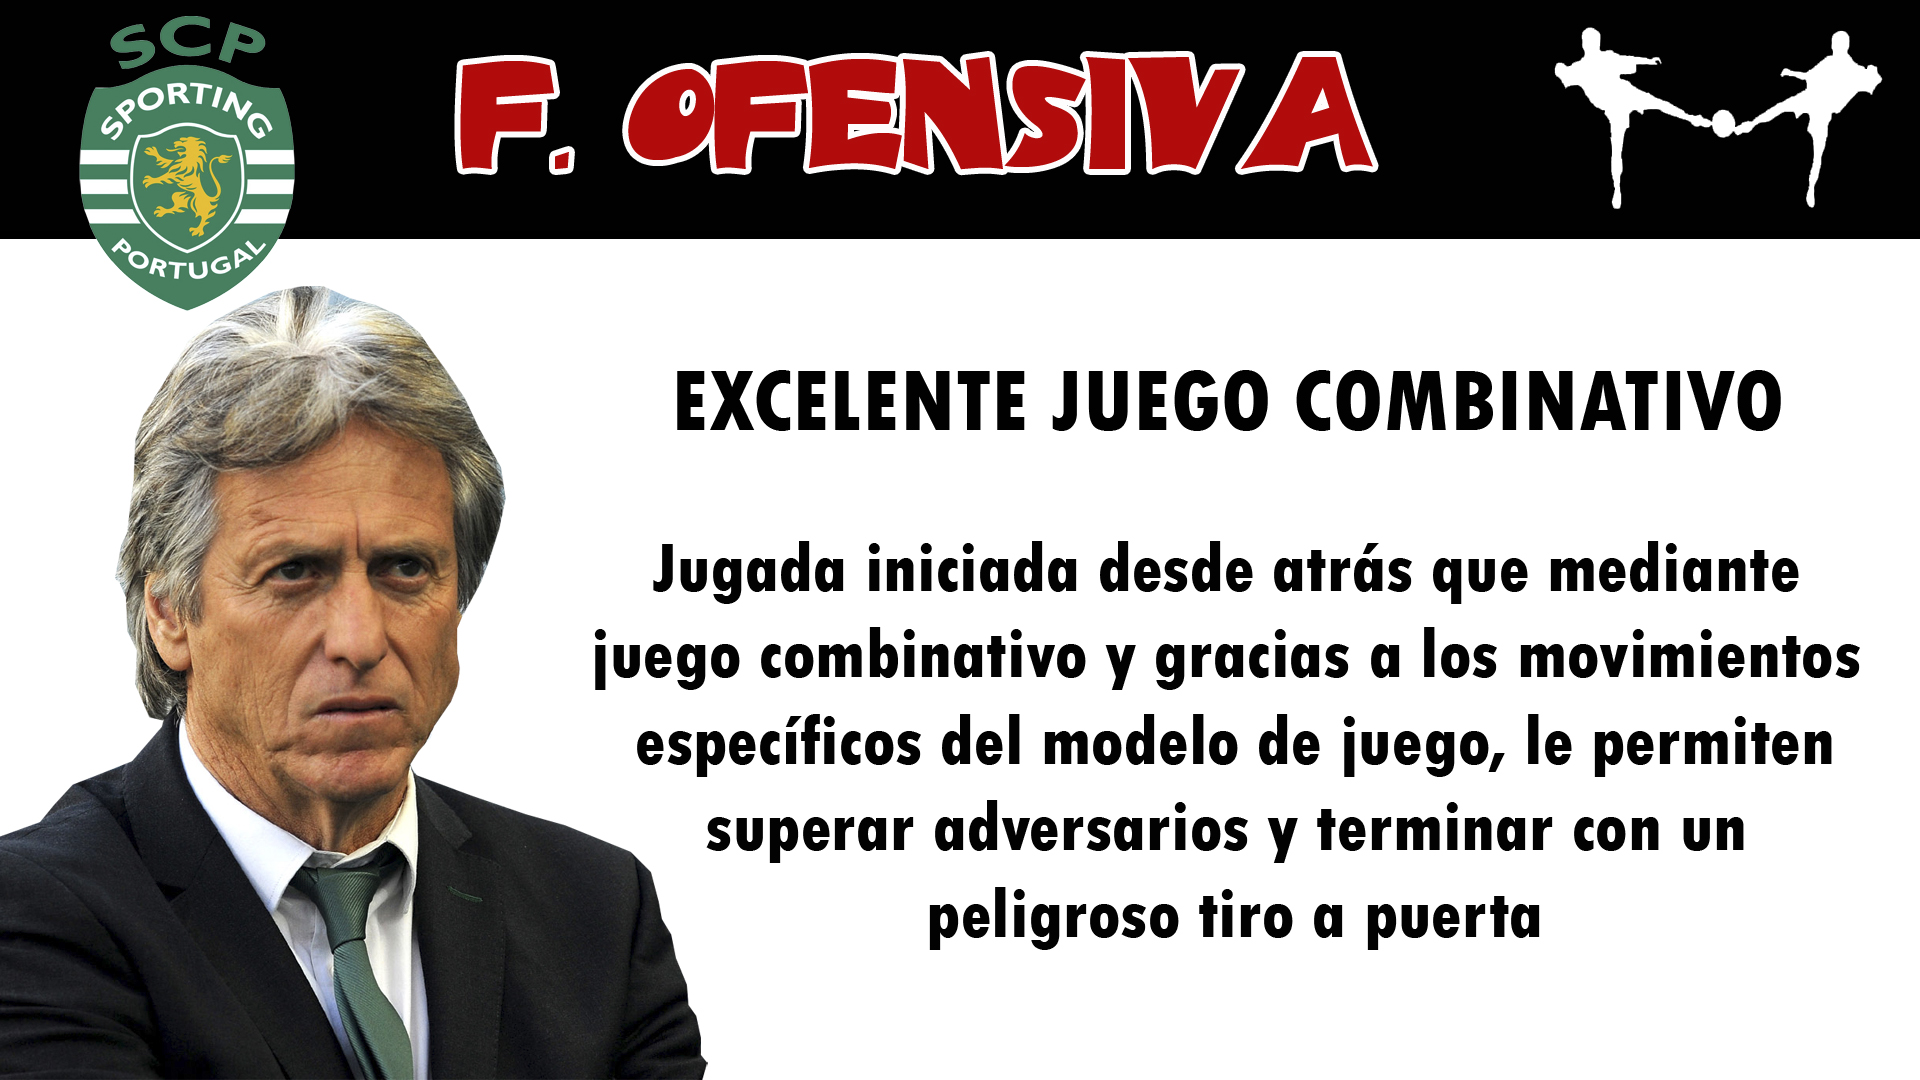 futbolcarrasco sporting lisboa champions league jorge jesus entrenador